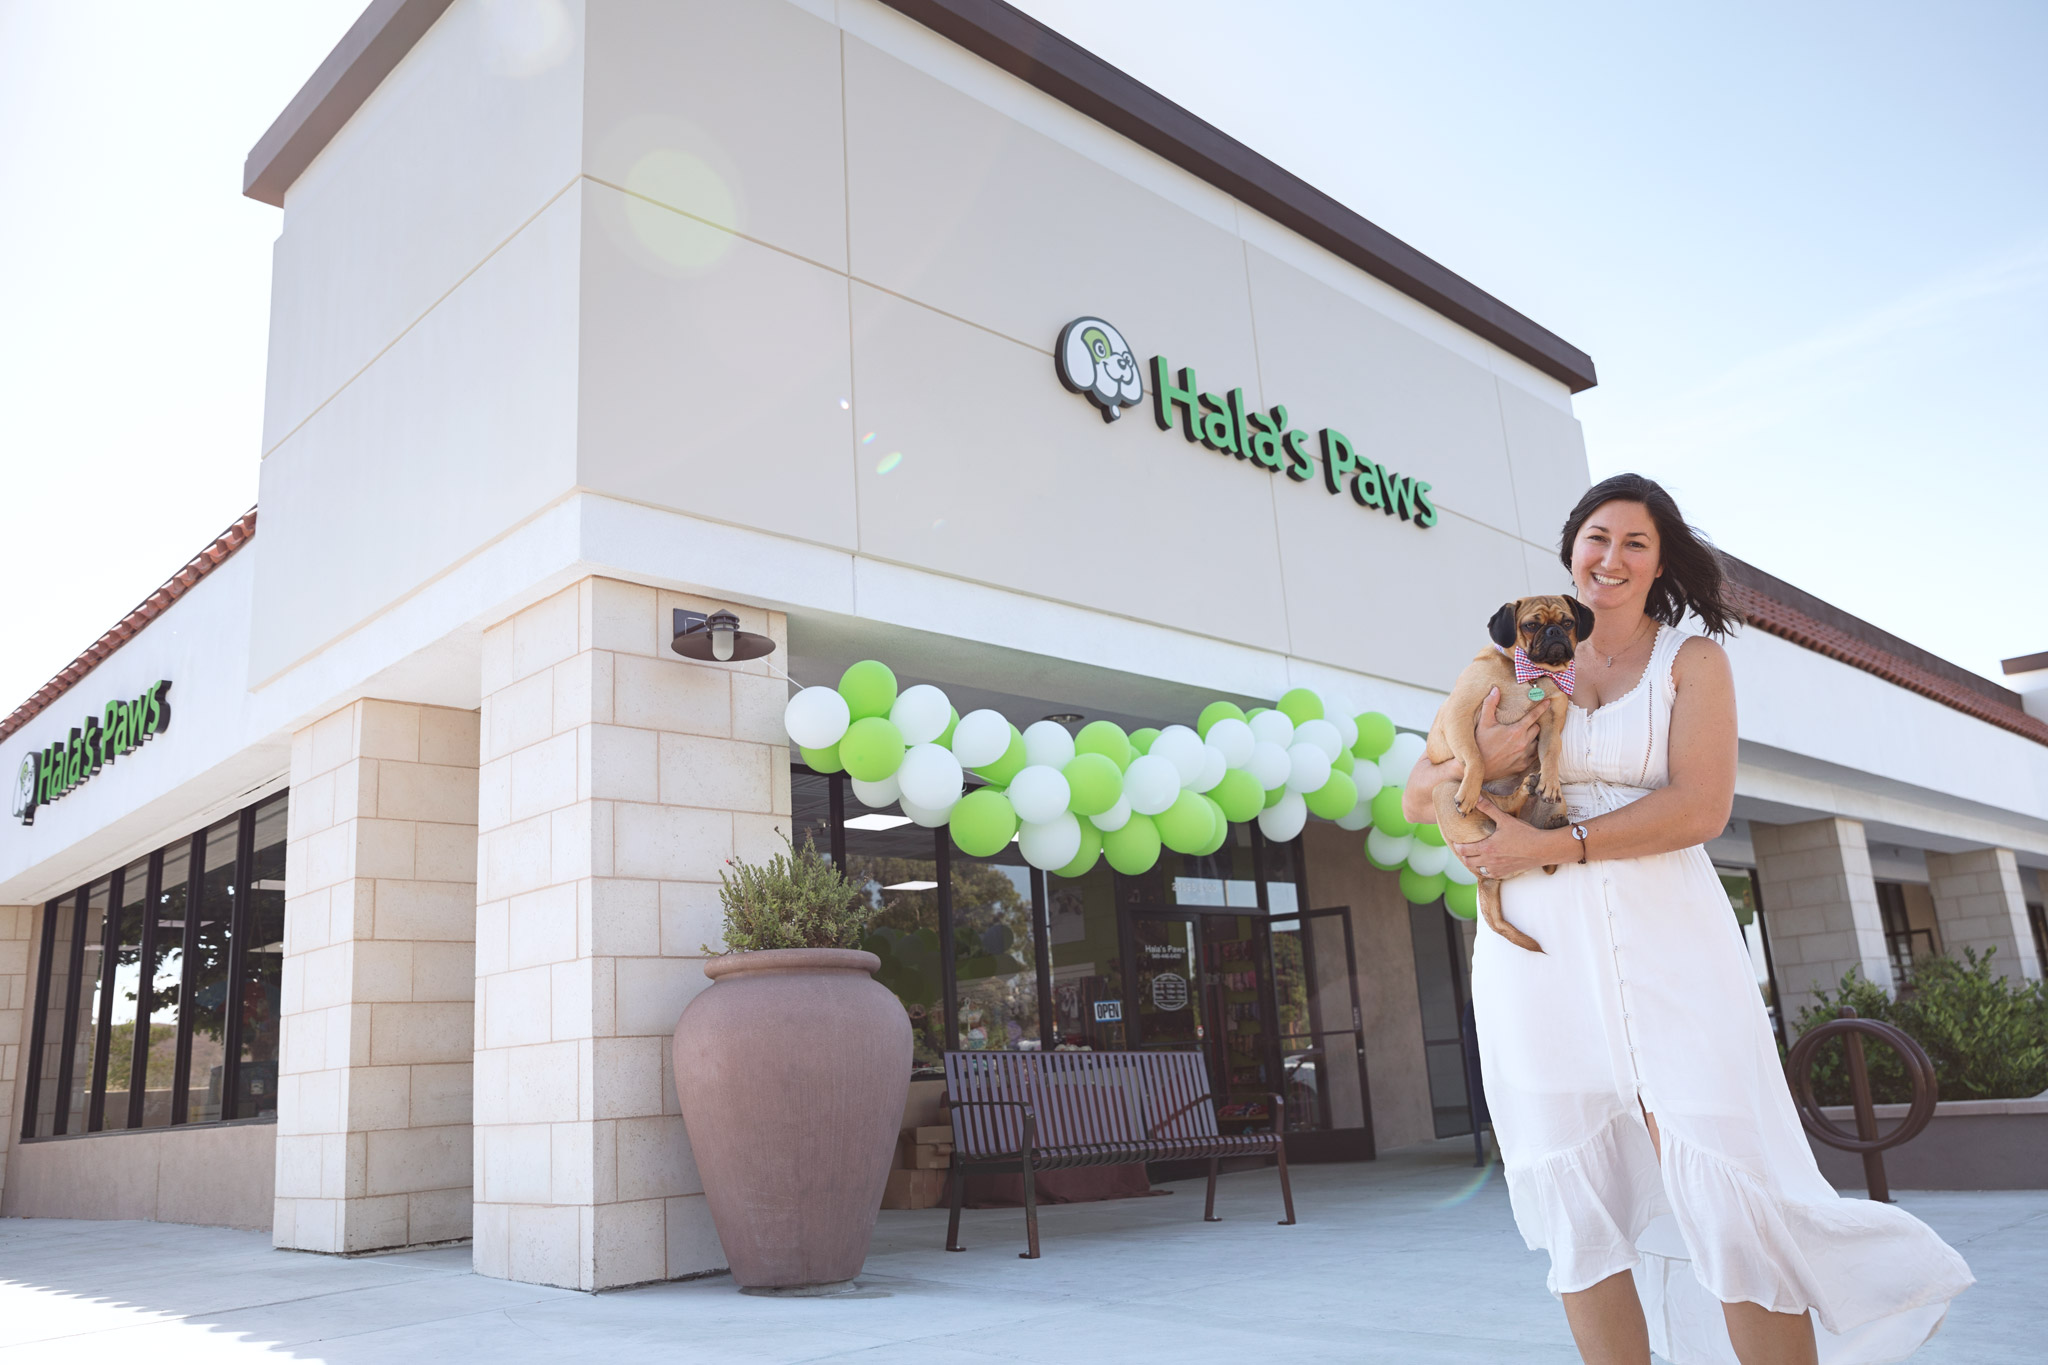 Hala at Hala's Paws Mission Viejo, CA